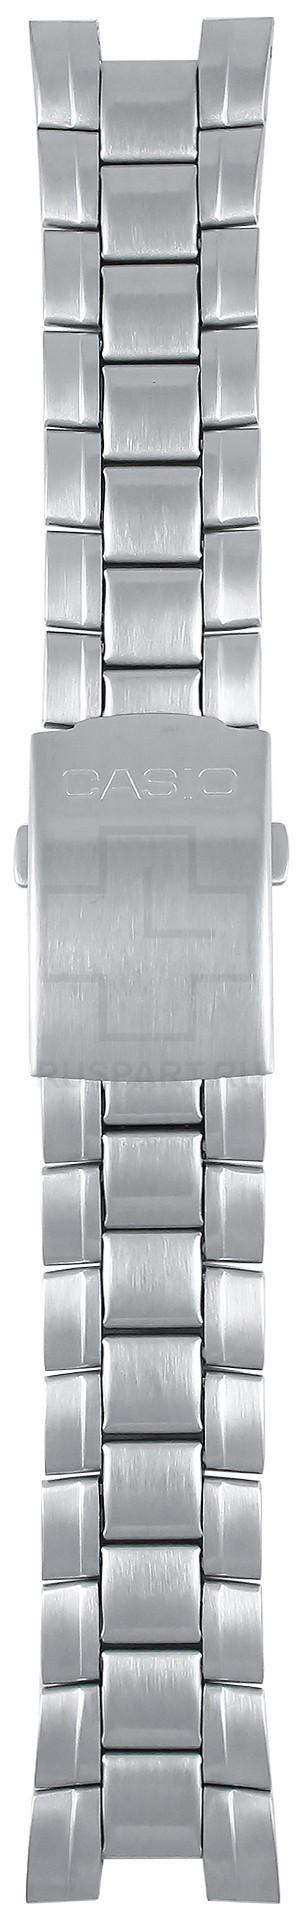 браслет Casio 10088680 EF-305D-1AV